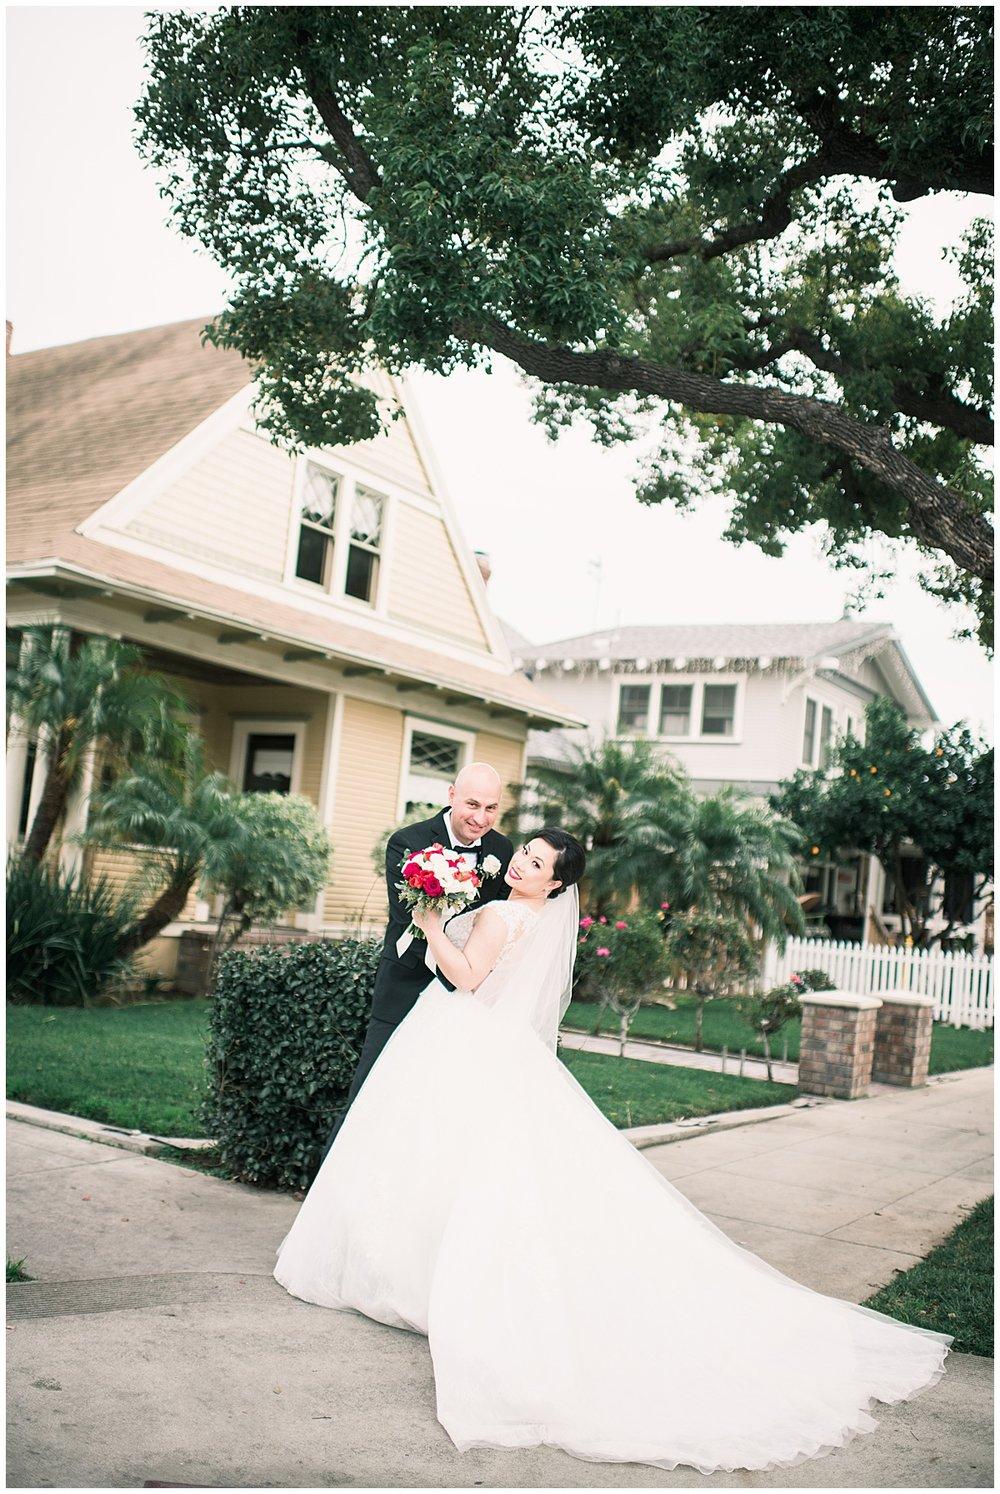 Chapel-of-orange-wedding-Carissa-Woo-Photography_0001.jpg